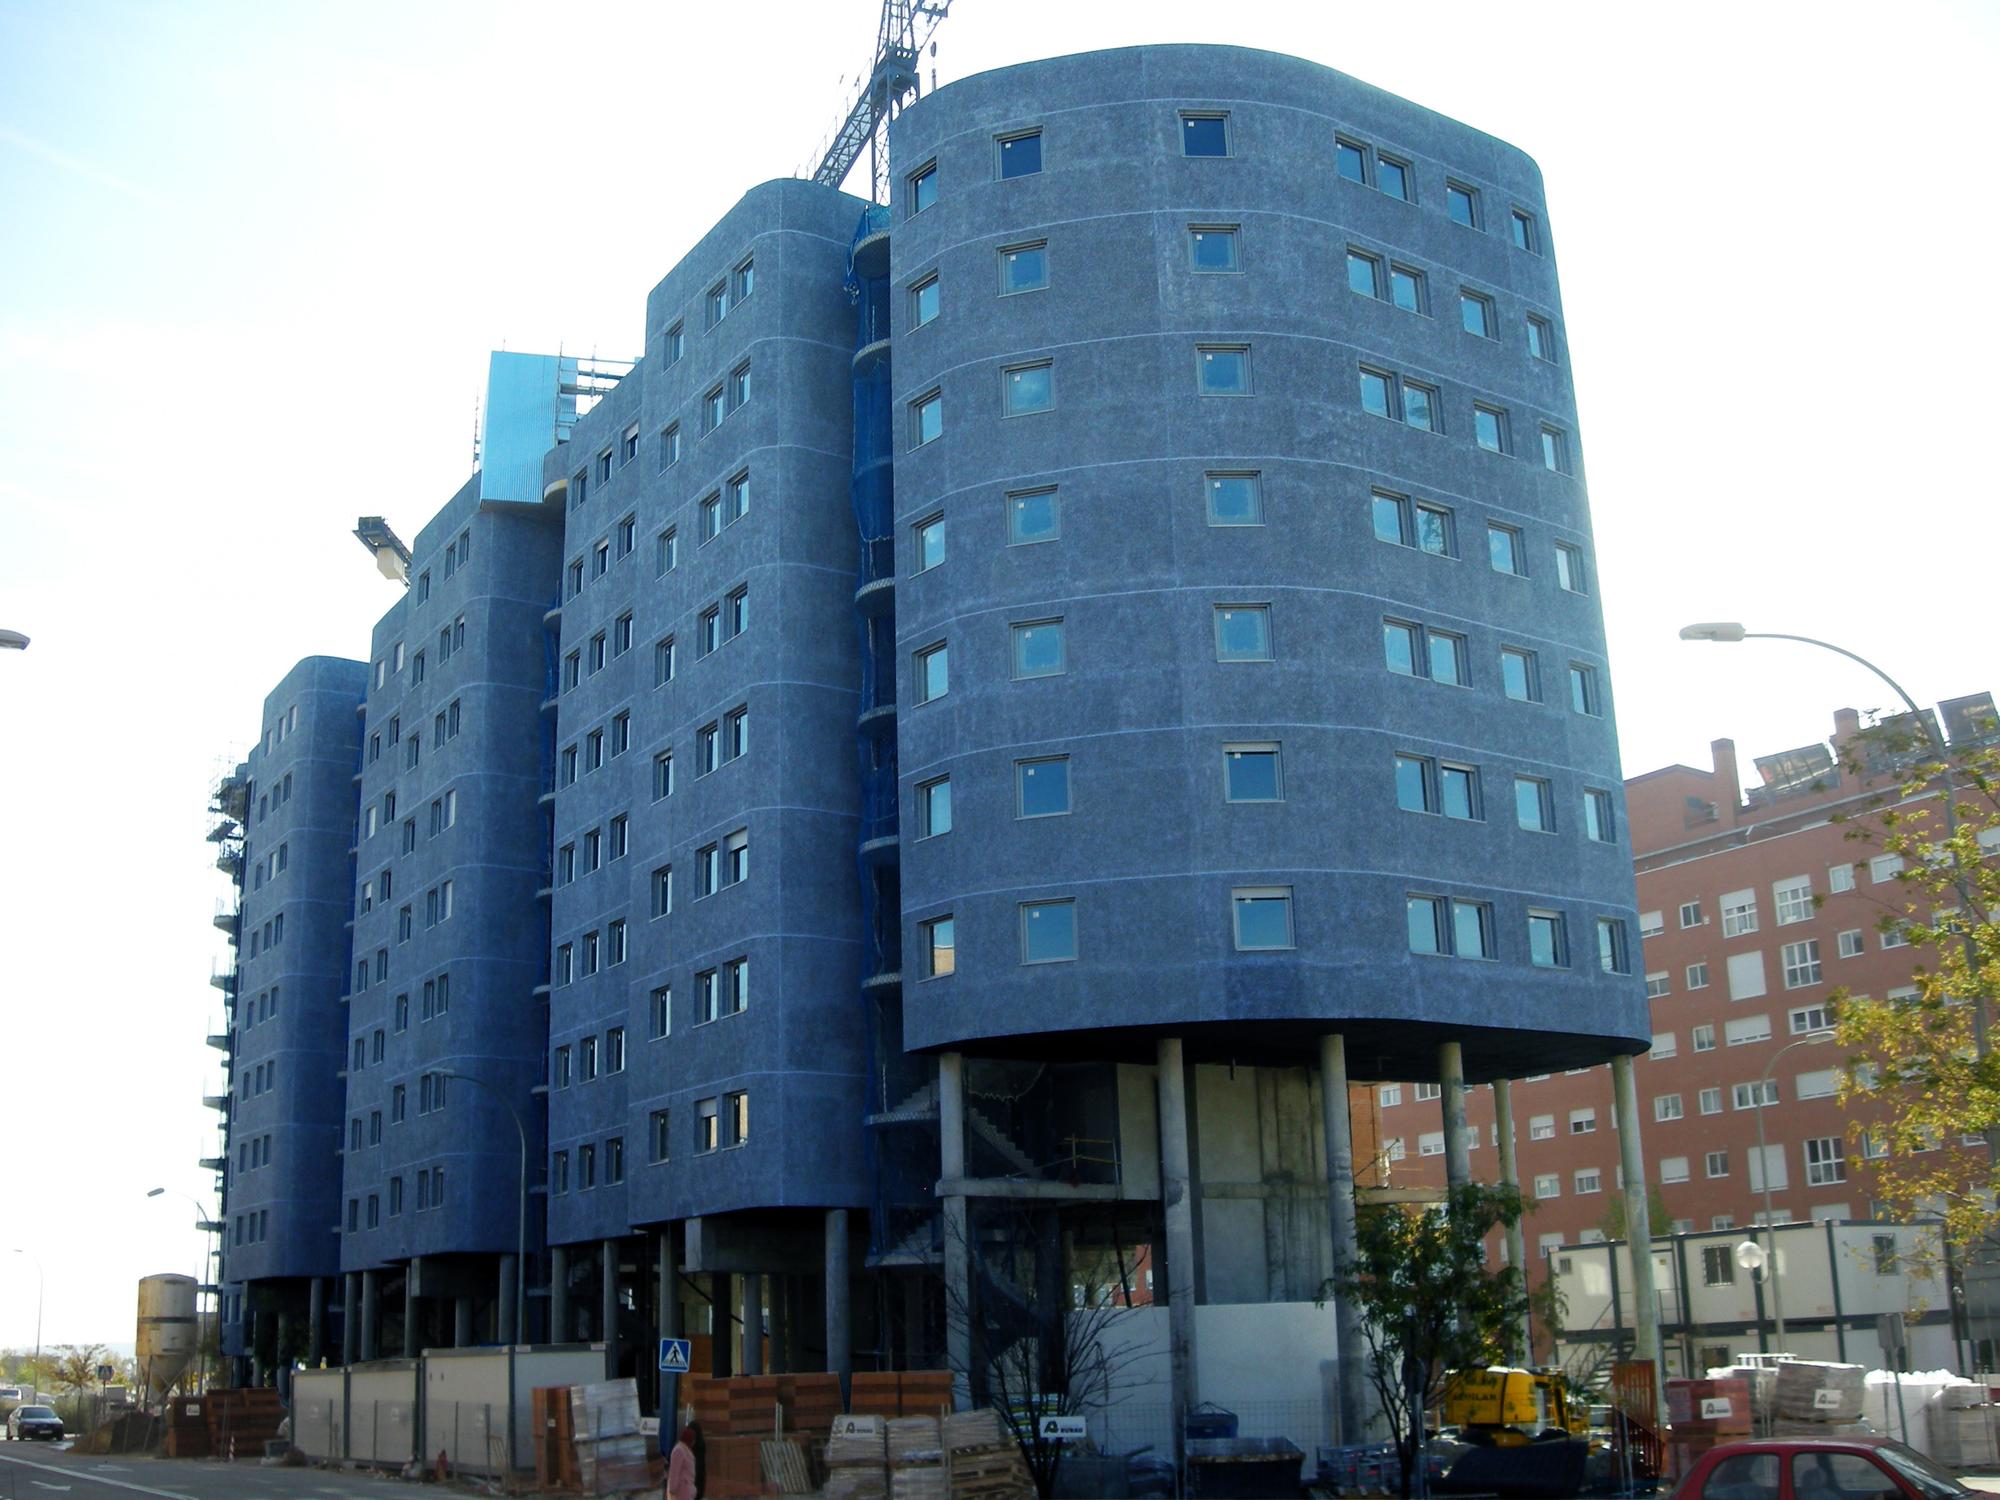 In Progress: Vallecas Housing / CRAB Studio, Courtesy of CRAB Studio